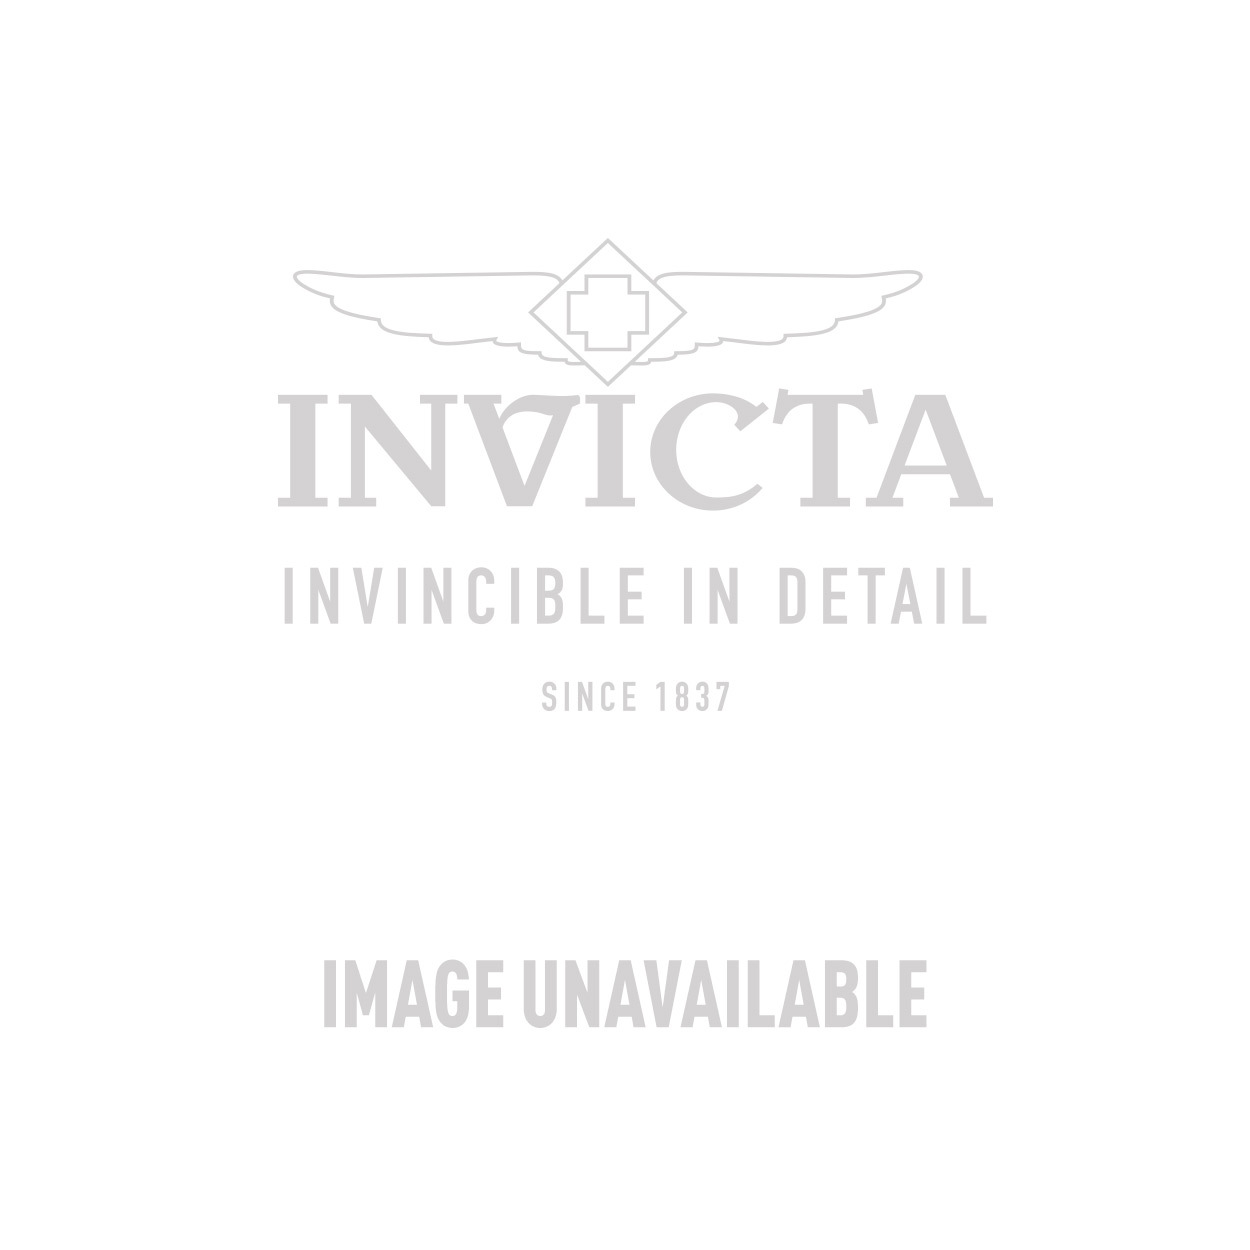 Invicta Aviator Quartz Watch - Gold, Stainless Steel case with Steel, Gold tone Stainless Steel band - Model 18852